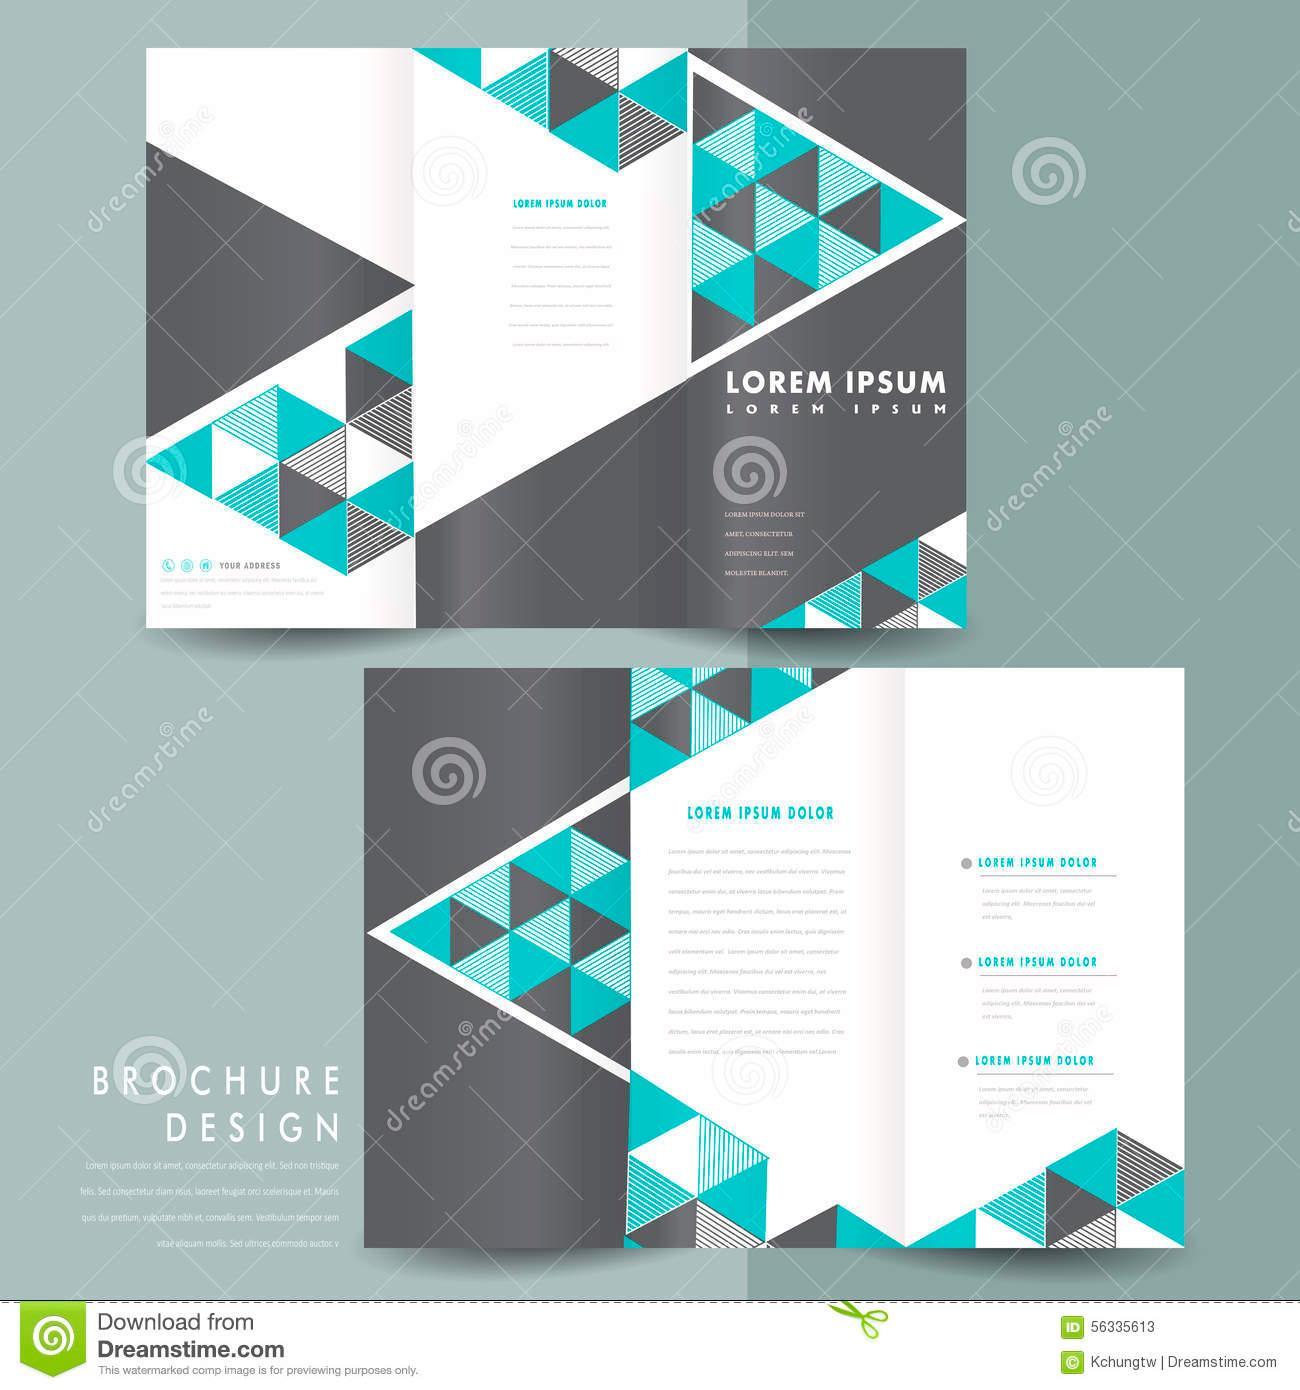 Free Download Tri Fold Brochure Templates Psd